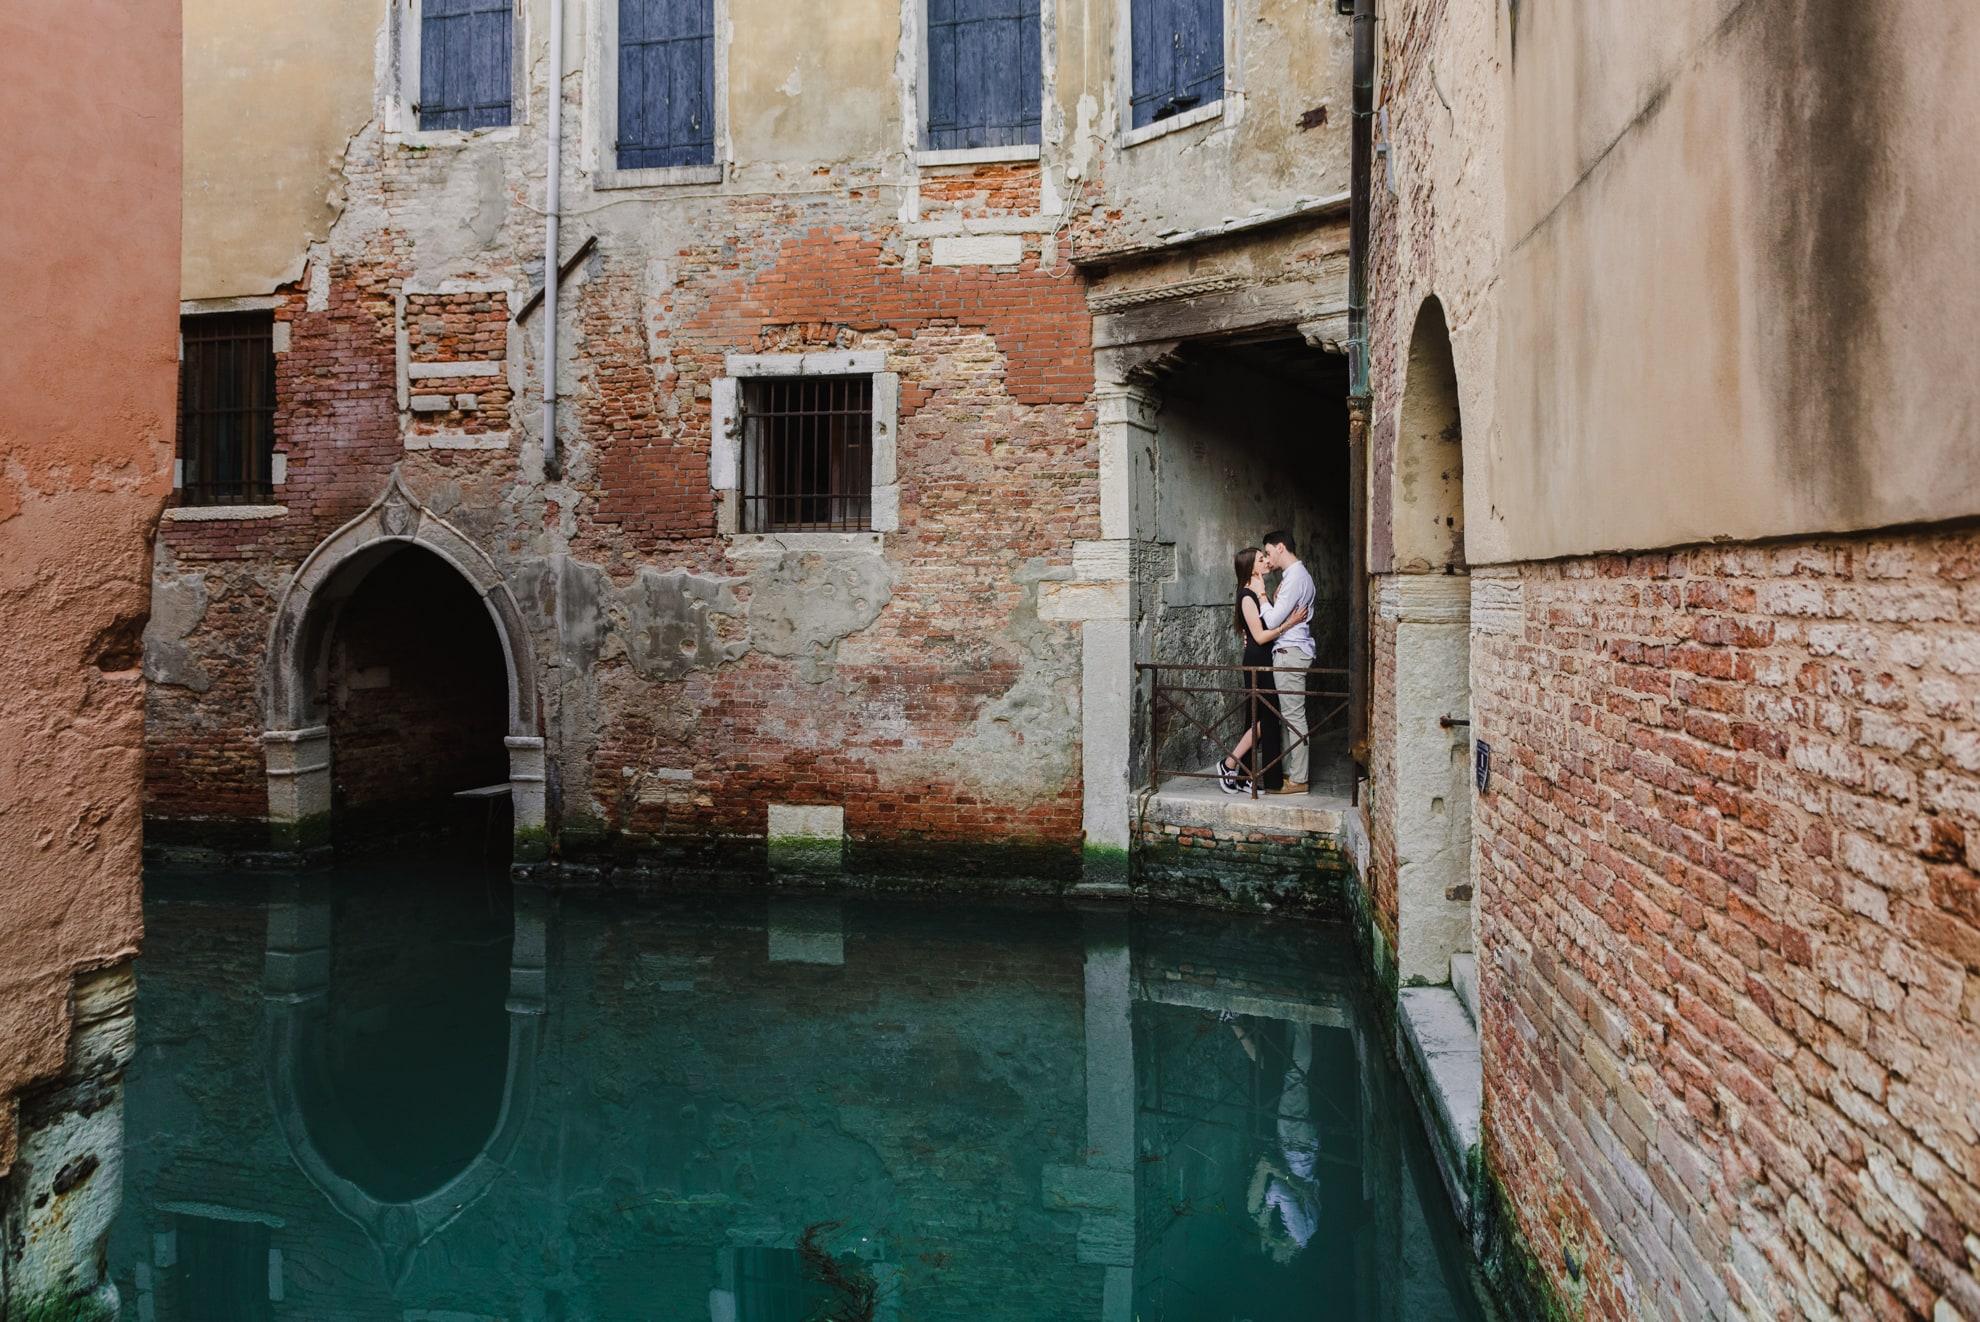 engagement venice venezia proposal proposta matrimonio fidanzamento irene pollacchi fotografa 5